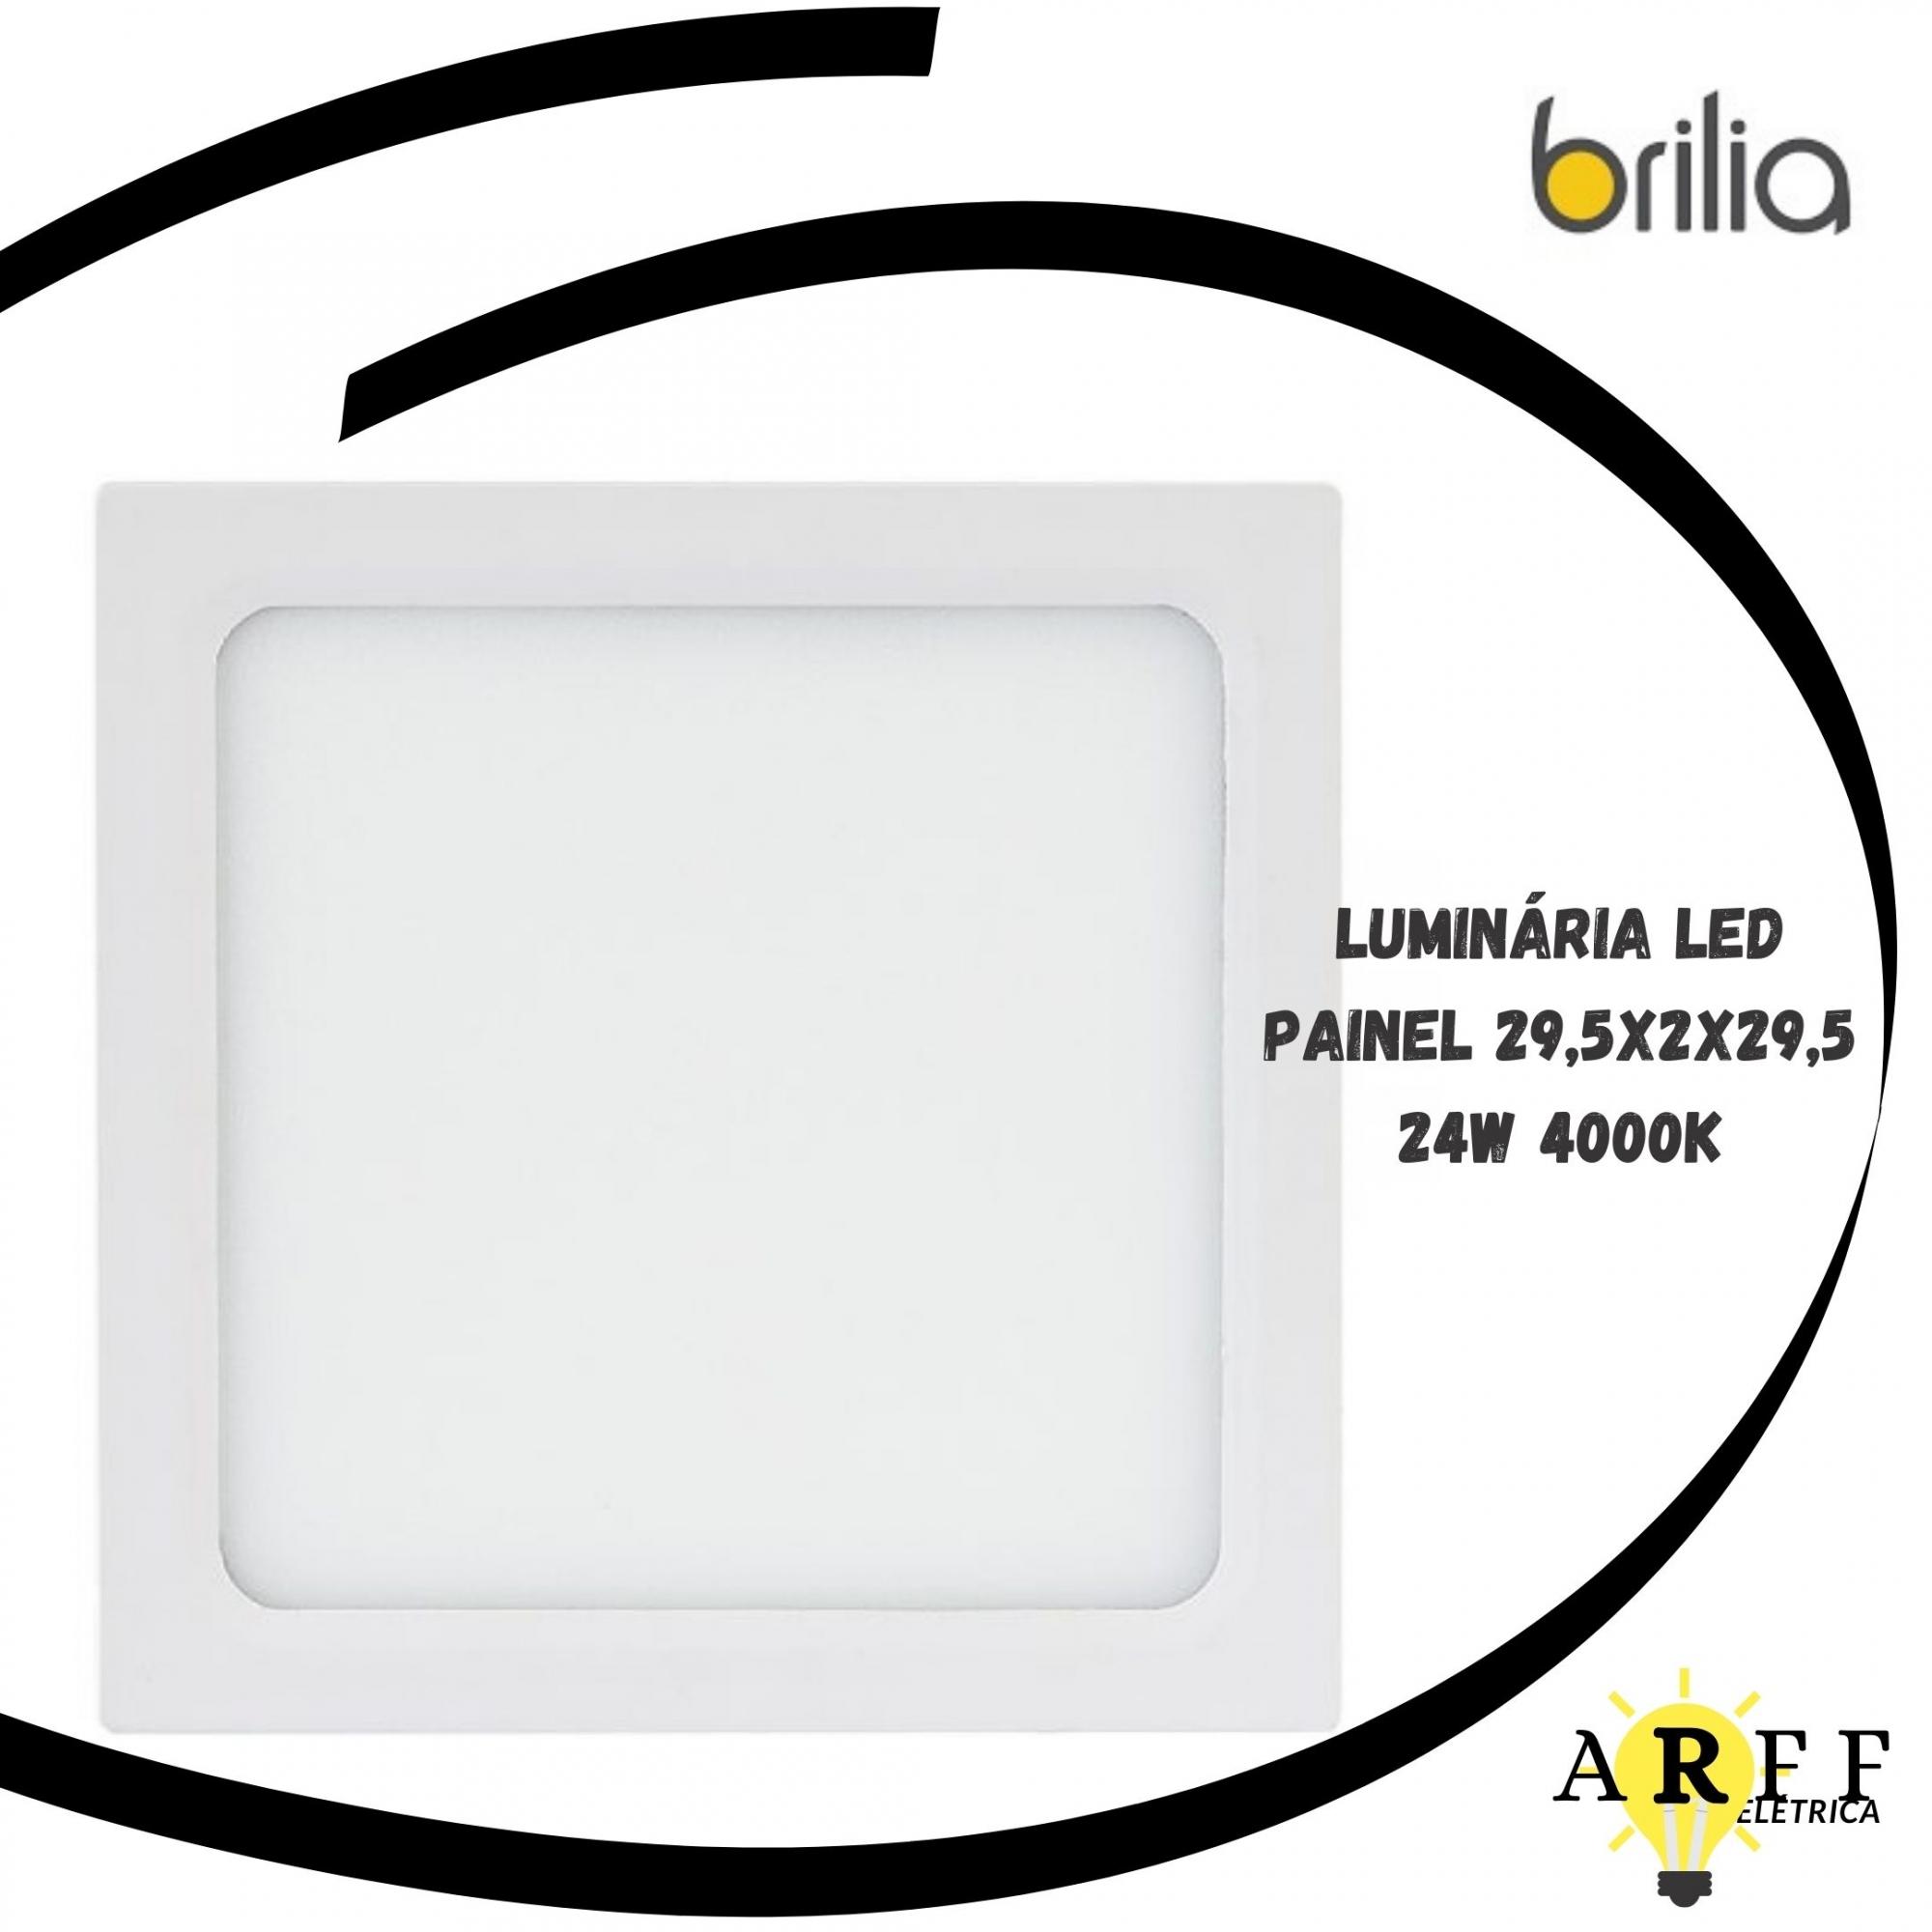 Luminária Painel Led Embutir 24W 4000k 29.5x2x29.5 Brilia